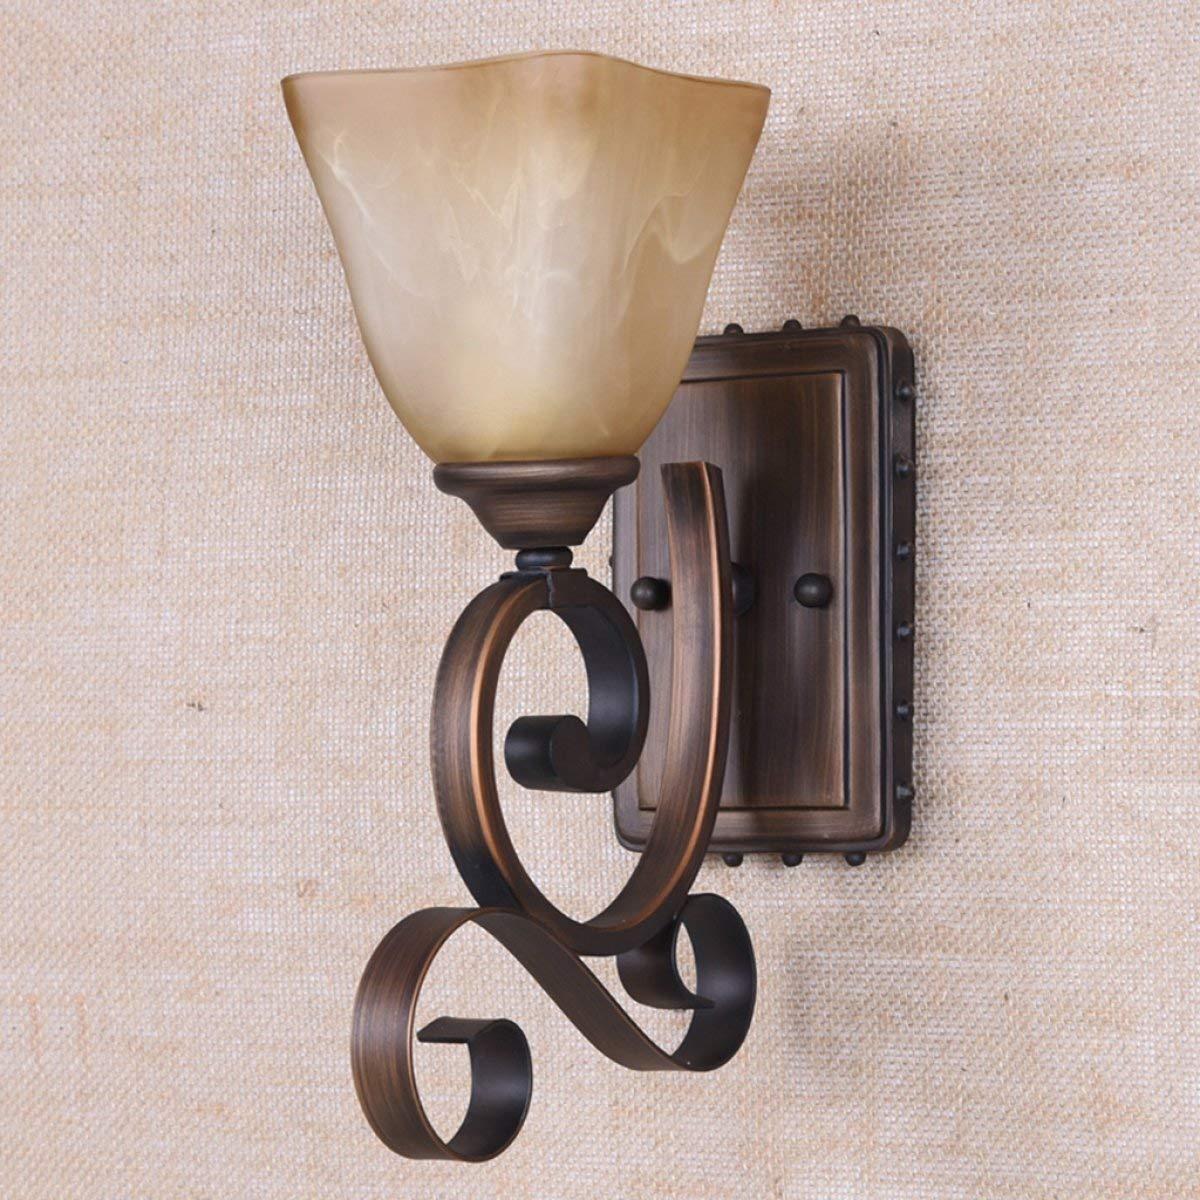 BXJ ヨーロッパ式のレトロの壁ランプの居間の寝室のバルコニーの通路の壁ランプ B07R8L7TZ9